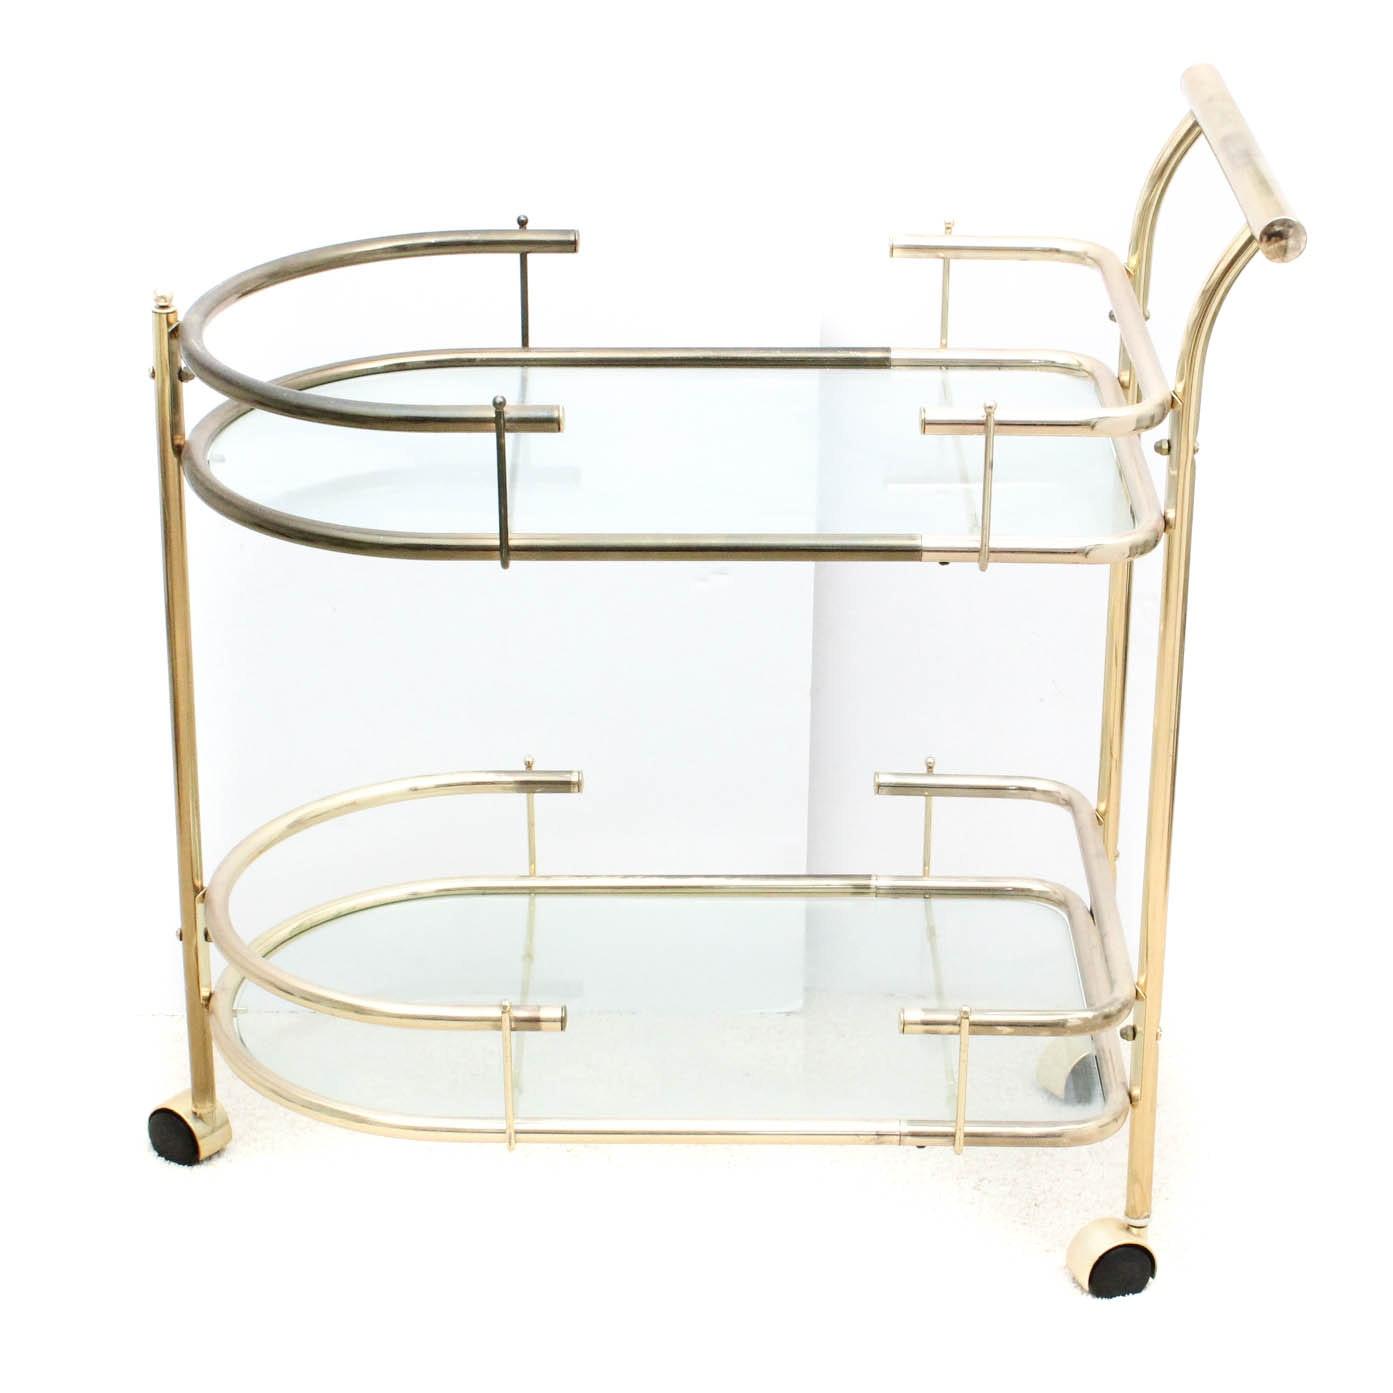 Vintage Metal and Glass Bar Cart